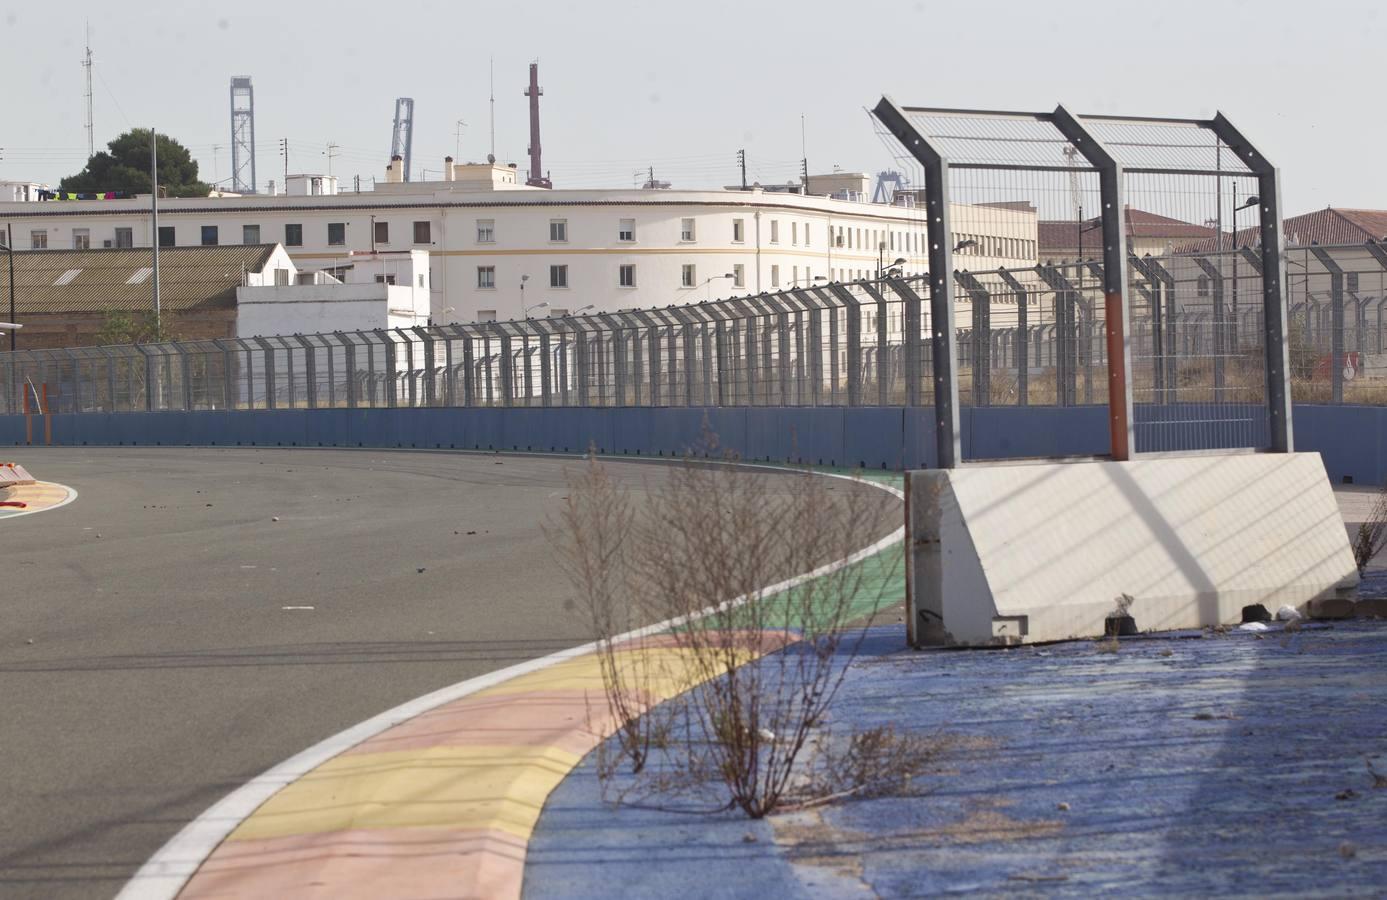 Circuito urbano de valencia estado actual